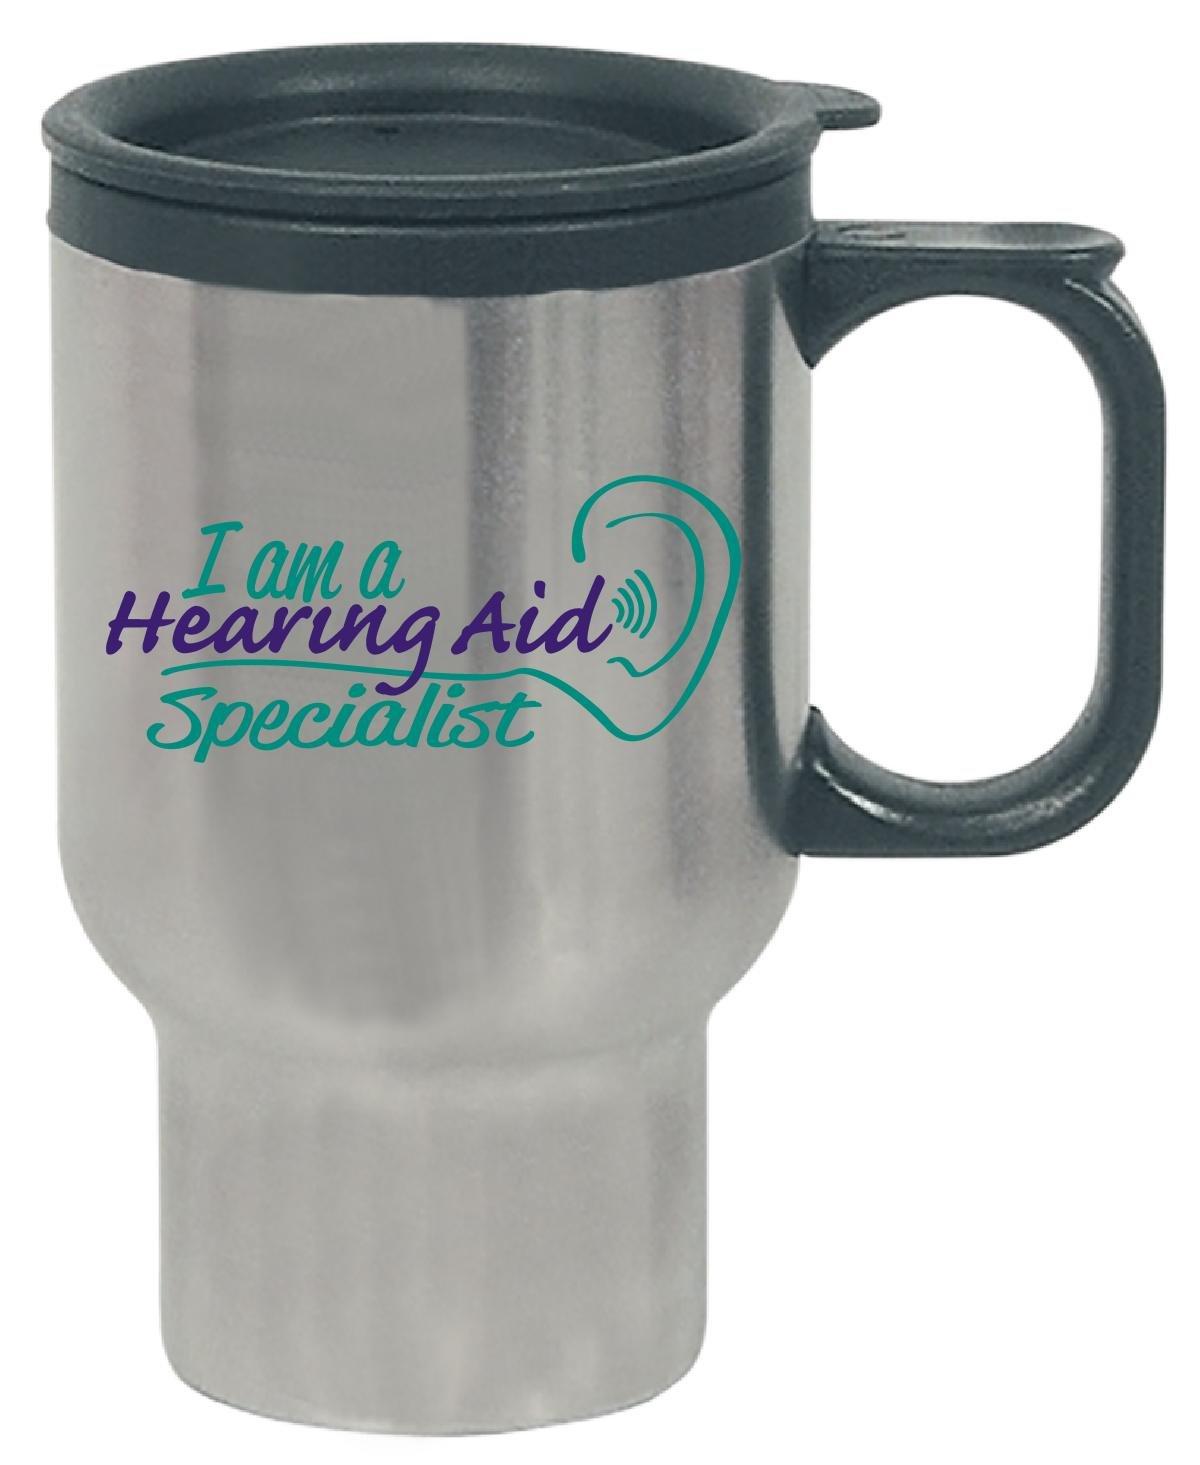 Hearing Aid Specialist - Travel Mug